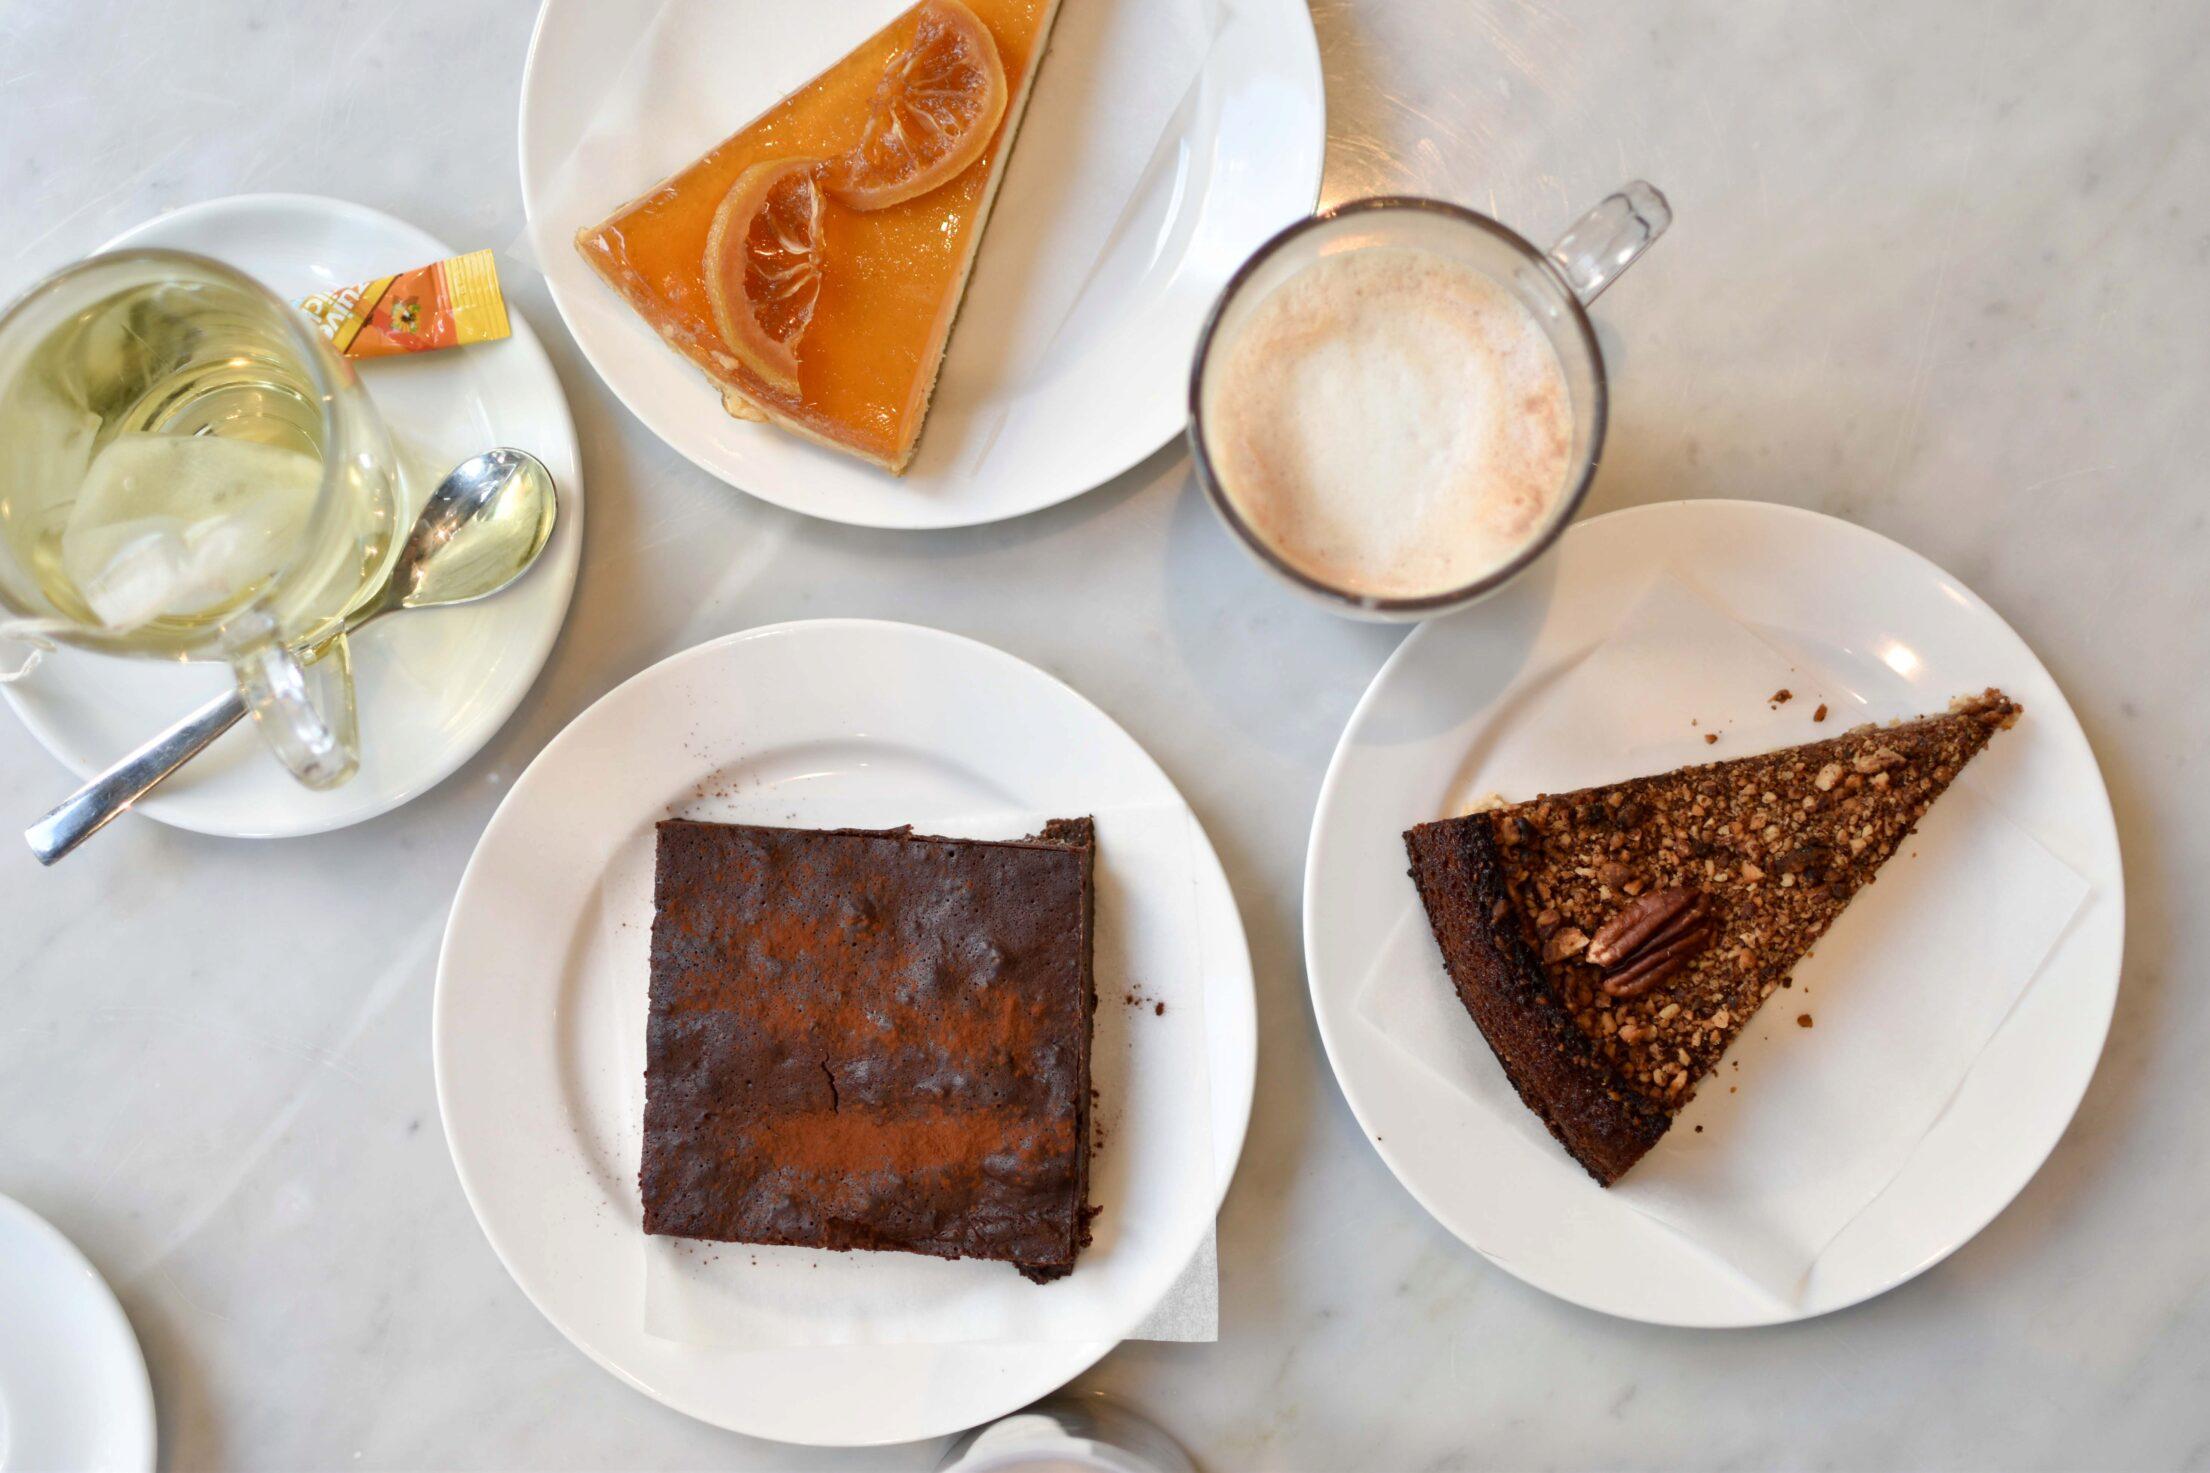 Luza's Caffeine Club: Hip & lekker taartjes eten